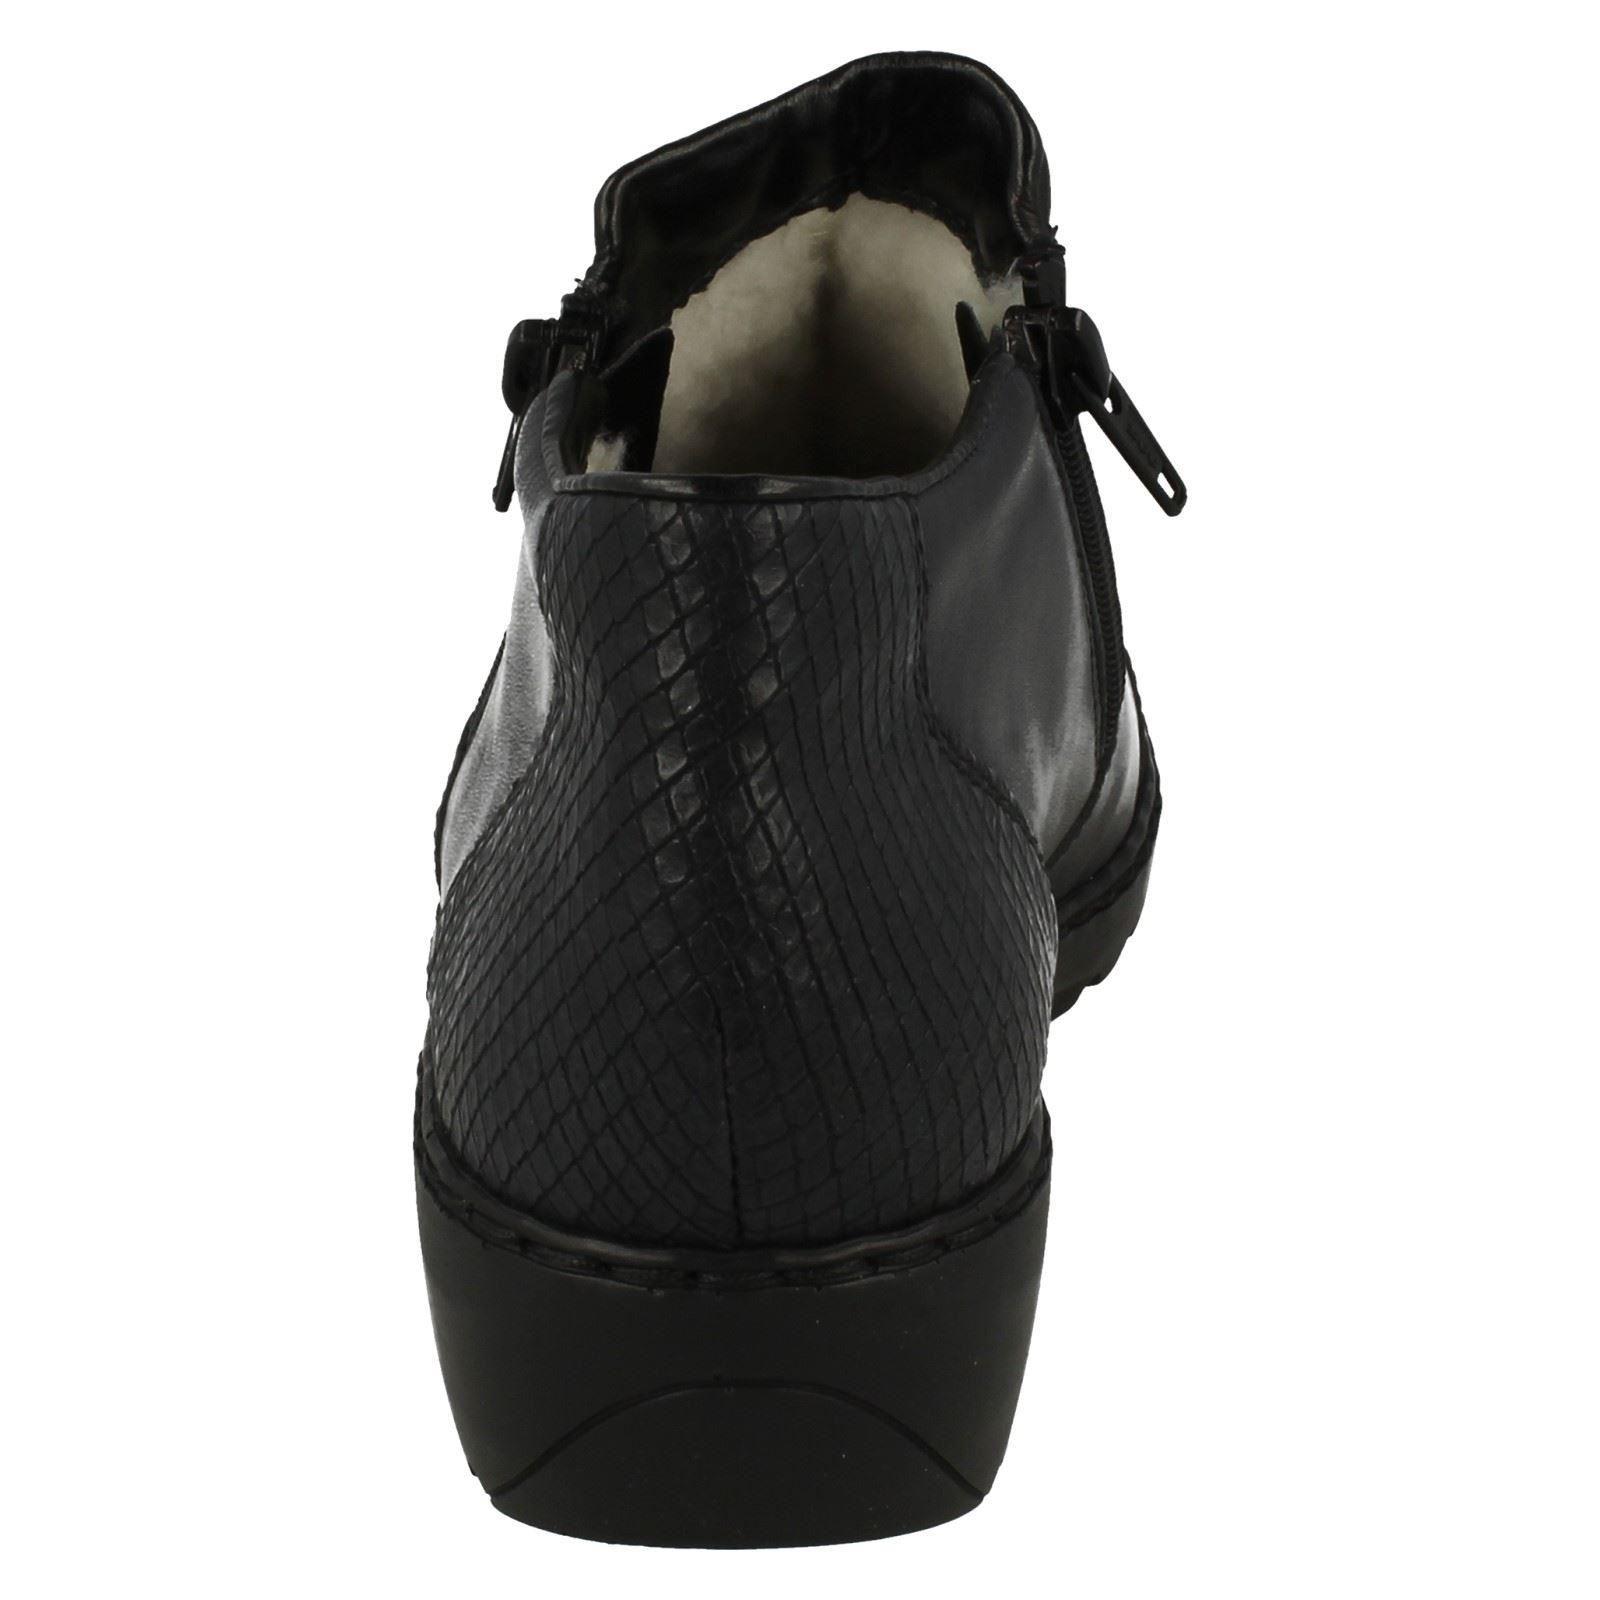 Ladies Boots Blue l6091 Ankle Warmlined Rieker rfwn6qtxvr